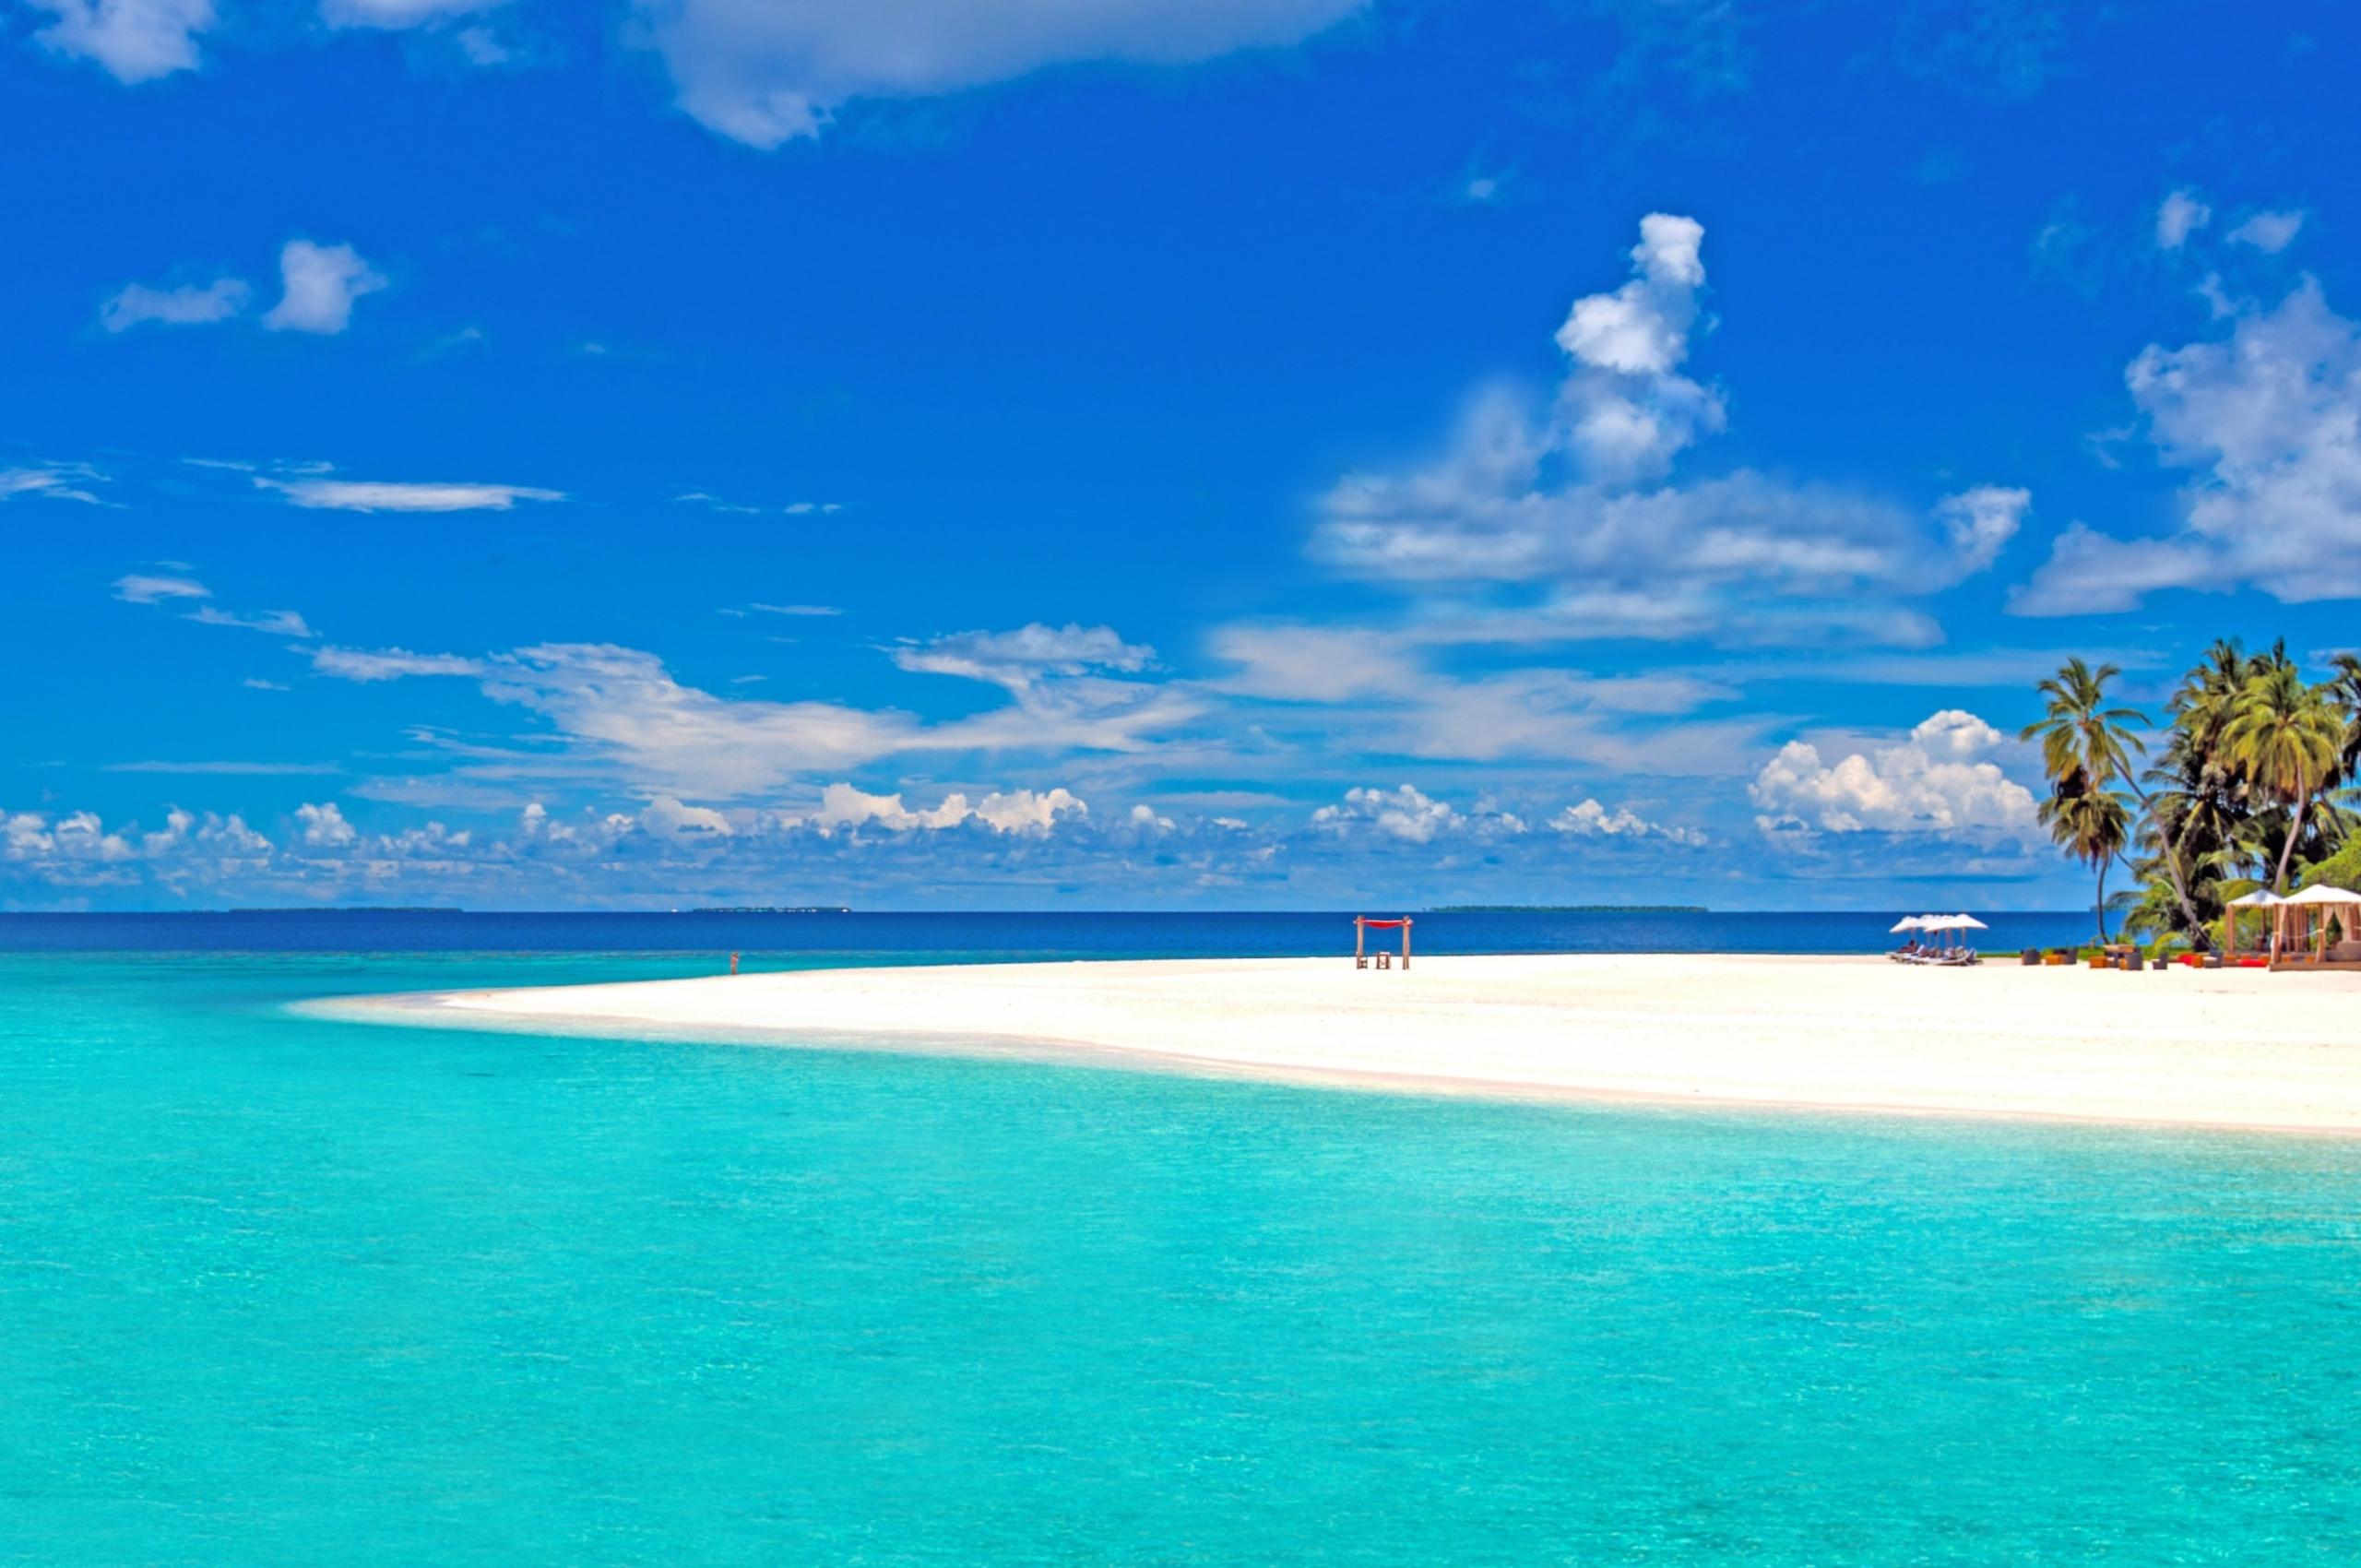 Free Download Hd Wallpapers For Mac Retina Beach Tropical Beach